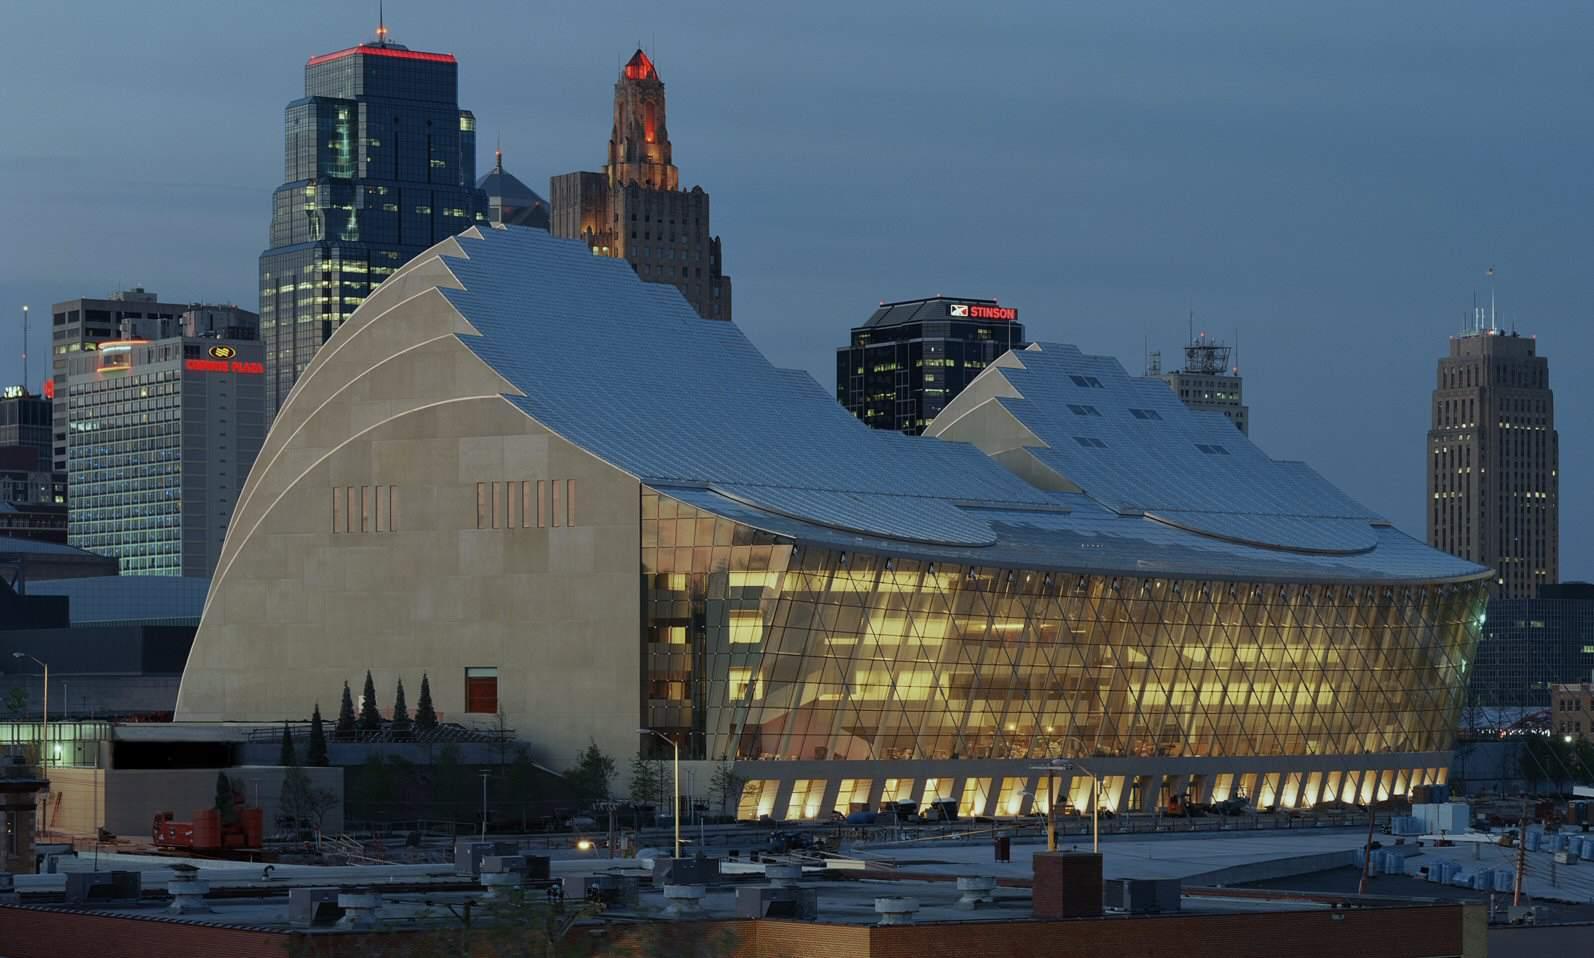 Kauffman Center for the Performing Arts, opened September 16, 2011, Kansas City, Missouri. Architect: Moshe Safdie